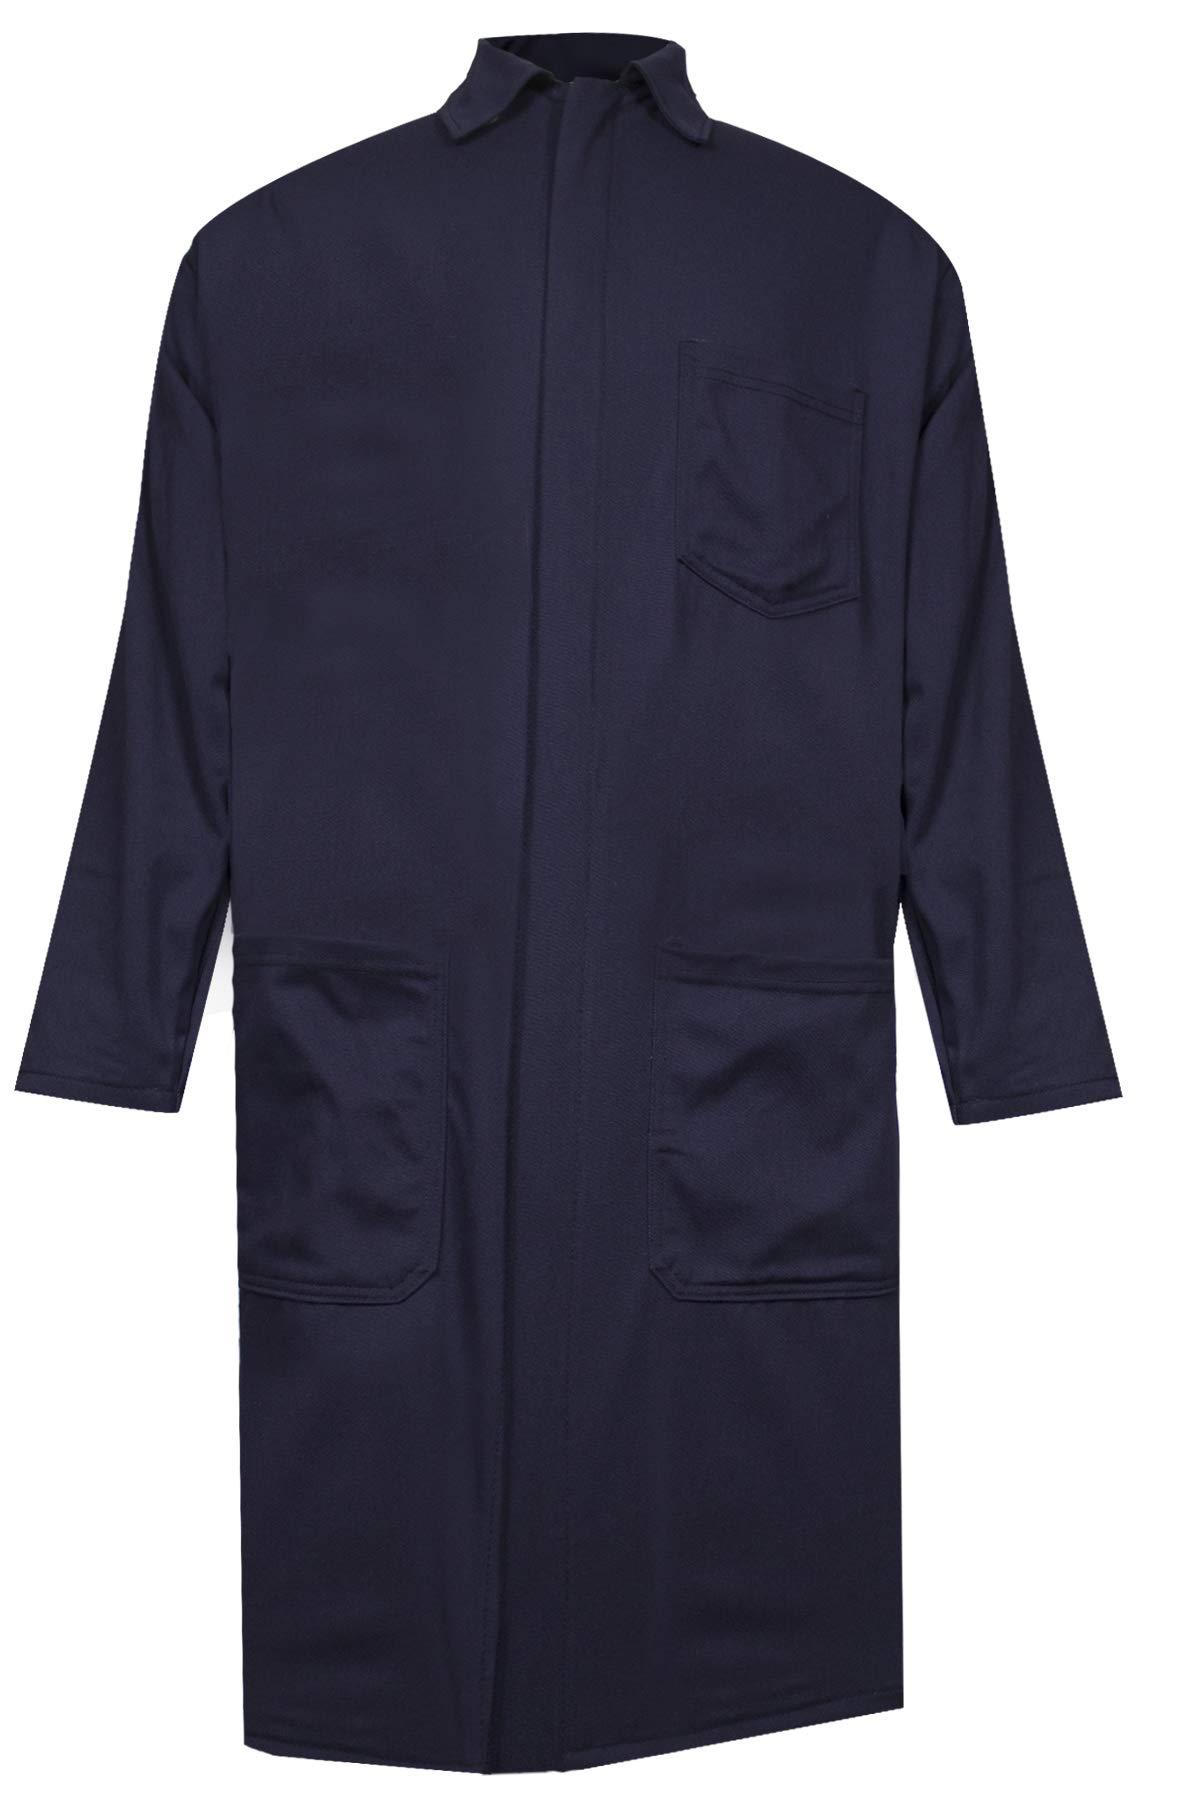 National Safety Apparel C09UPLC3X42 Ultrasoft Lab Coat, 88% Cotton, 12% Nylon FR, 3X-Large, Navy